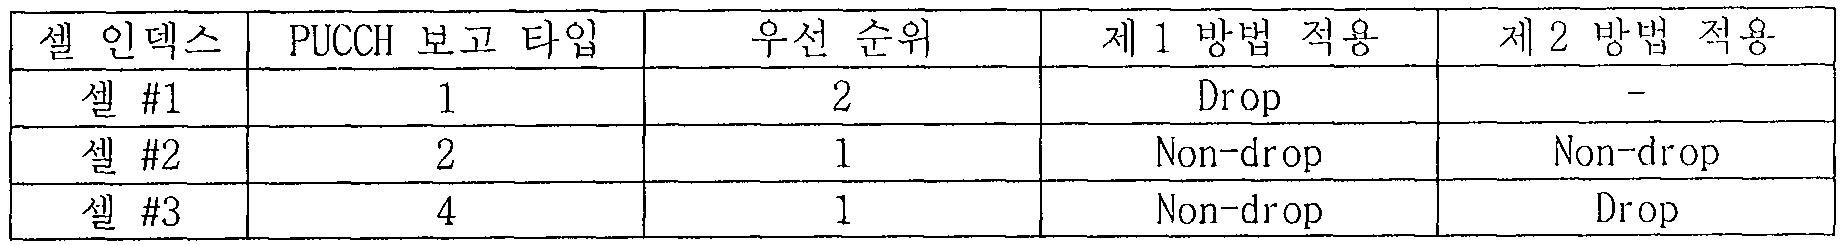 Figure 112011502155947-pat00029